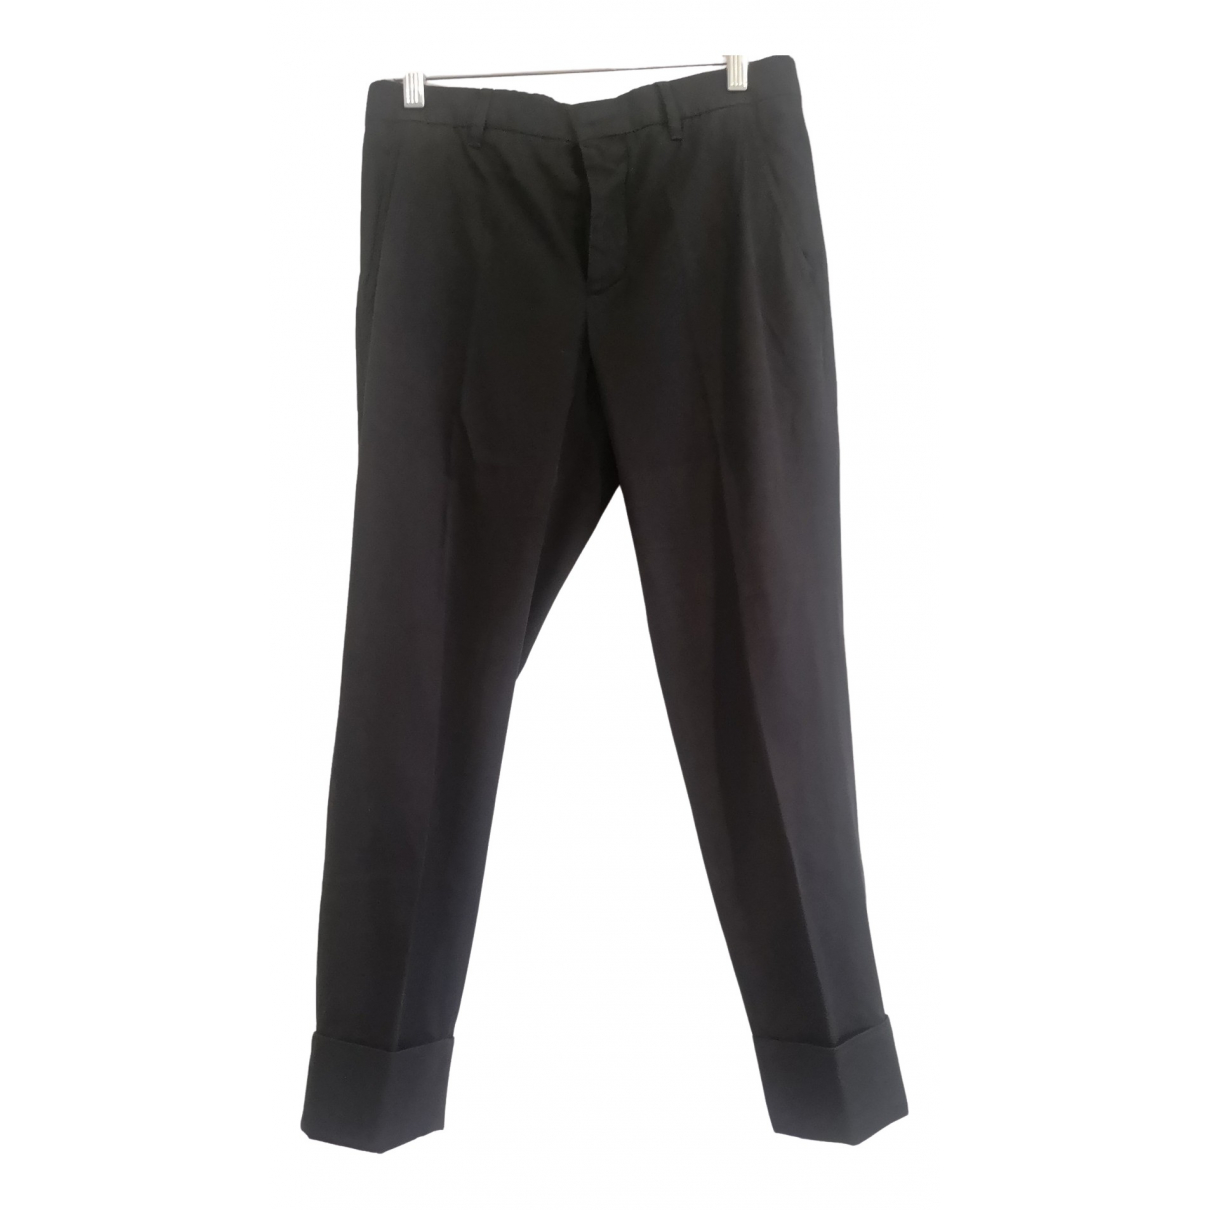 Miu Miu \N Black Cotton Trousers for Women 38 IT